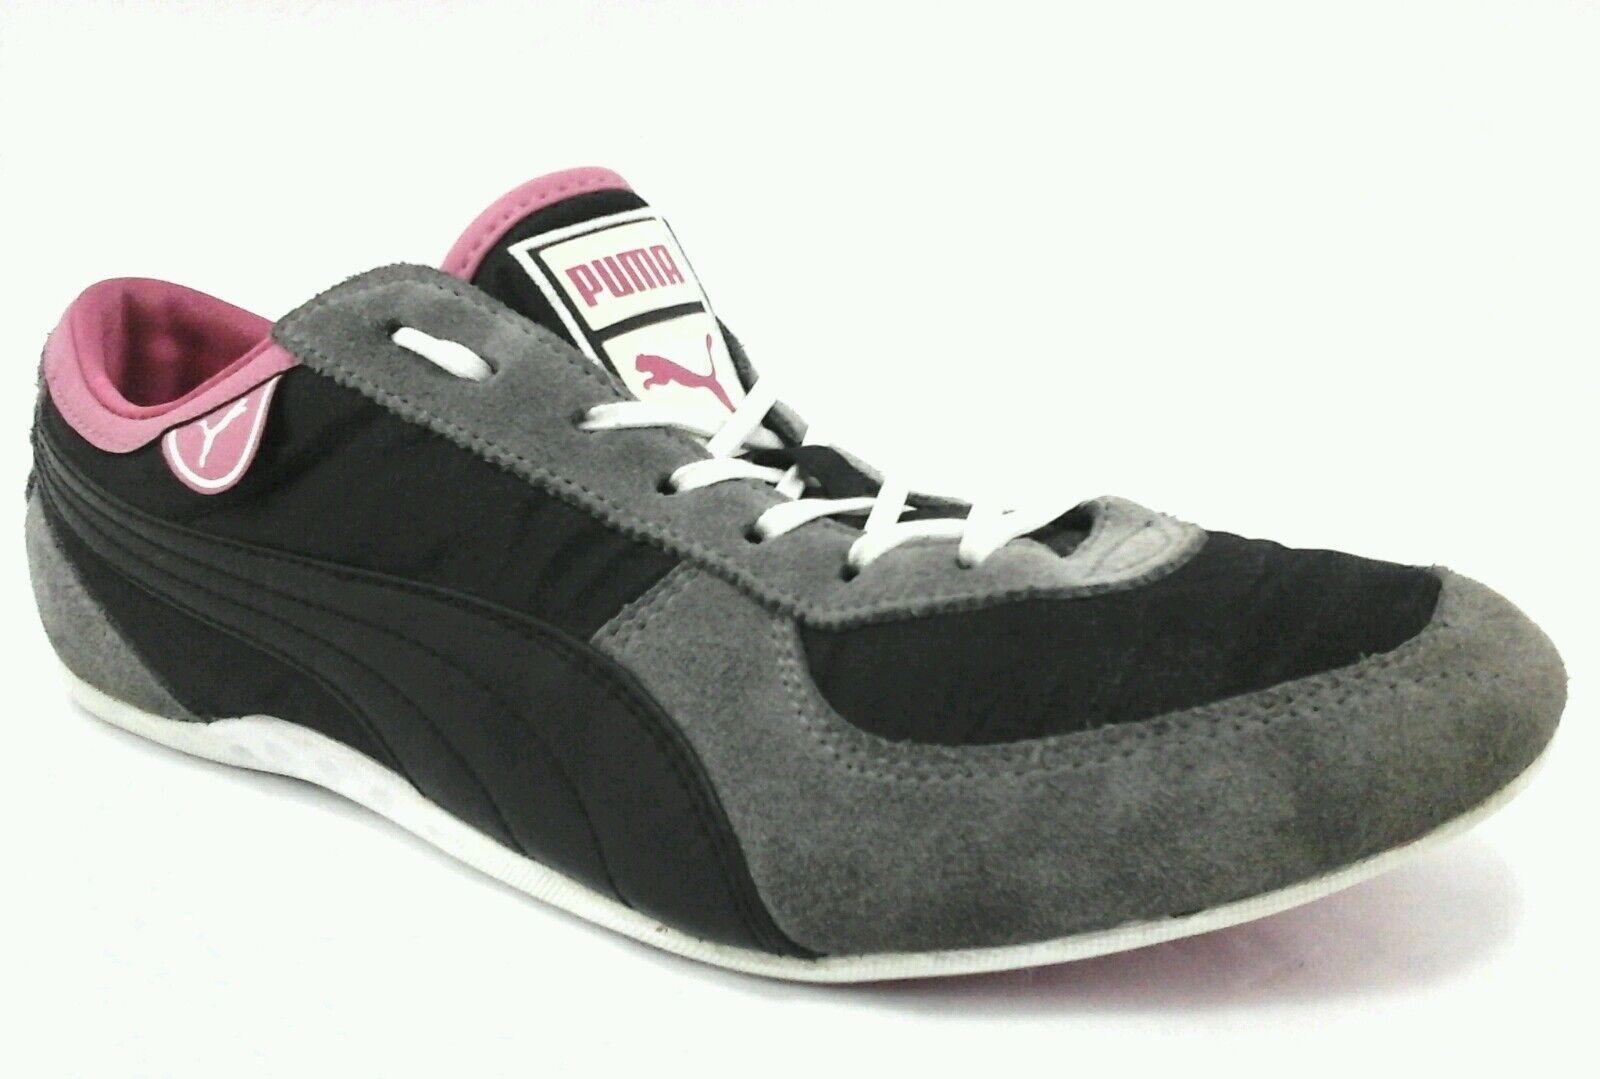 PUMA Sneakers Suede Noir/Gris/Rose Satin Chaussures Femme US 9.57 EU 40.5  85